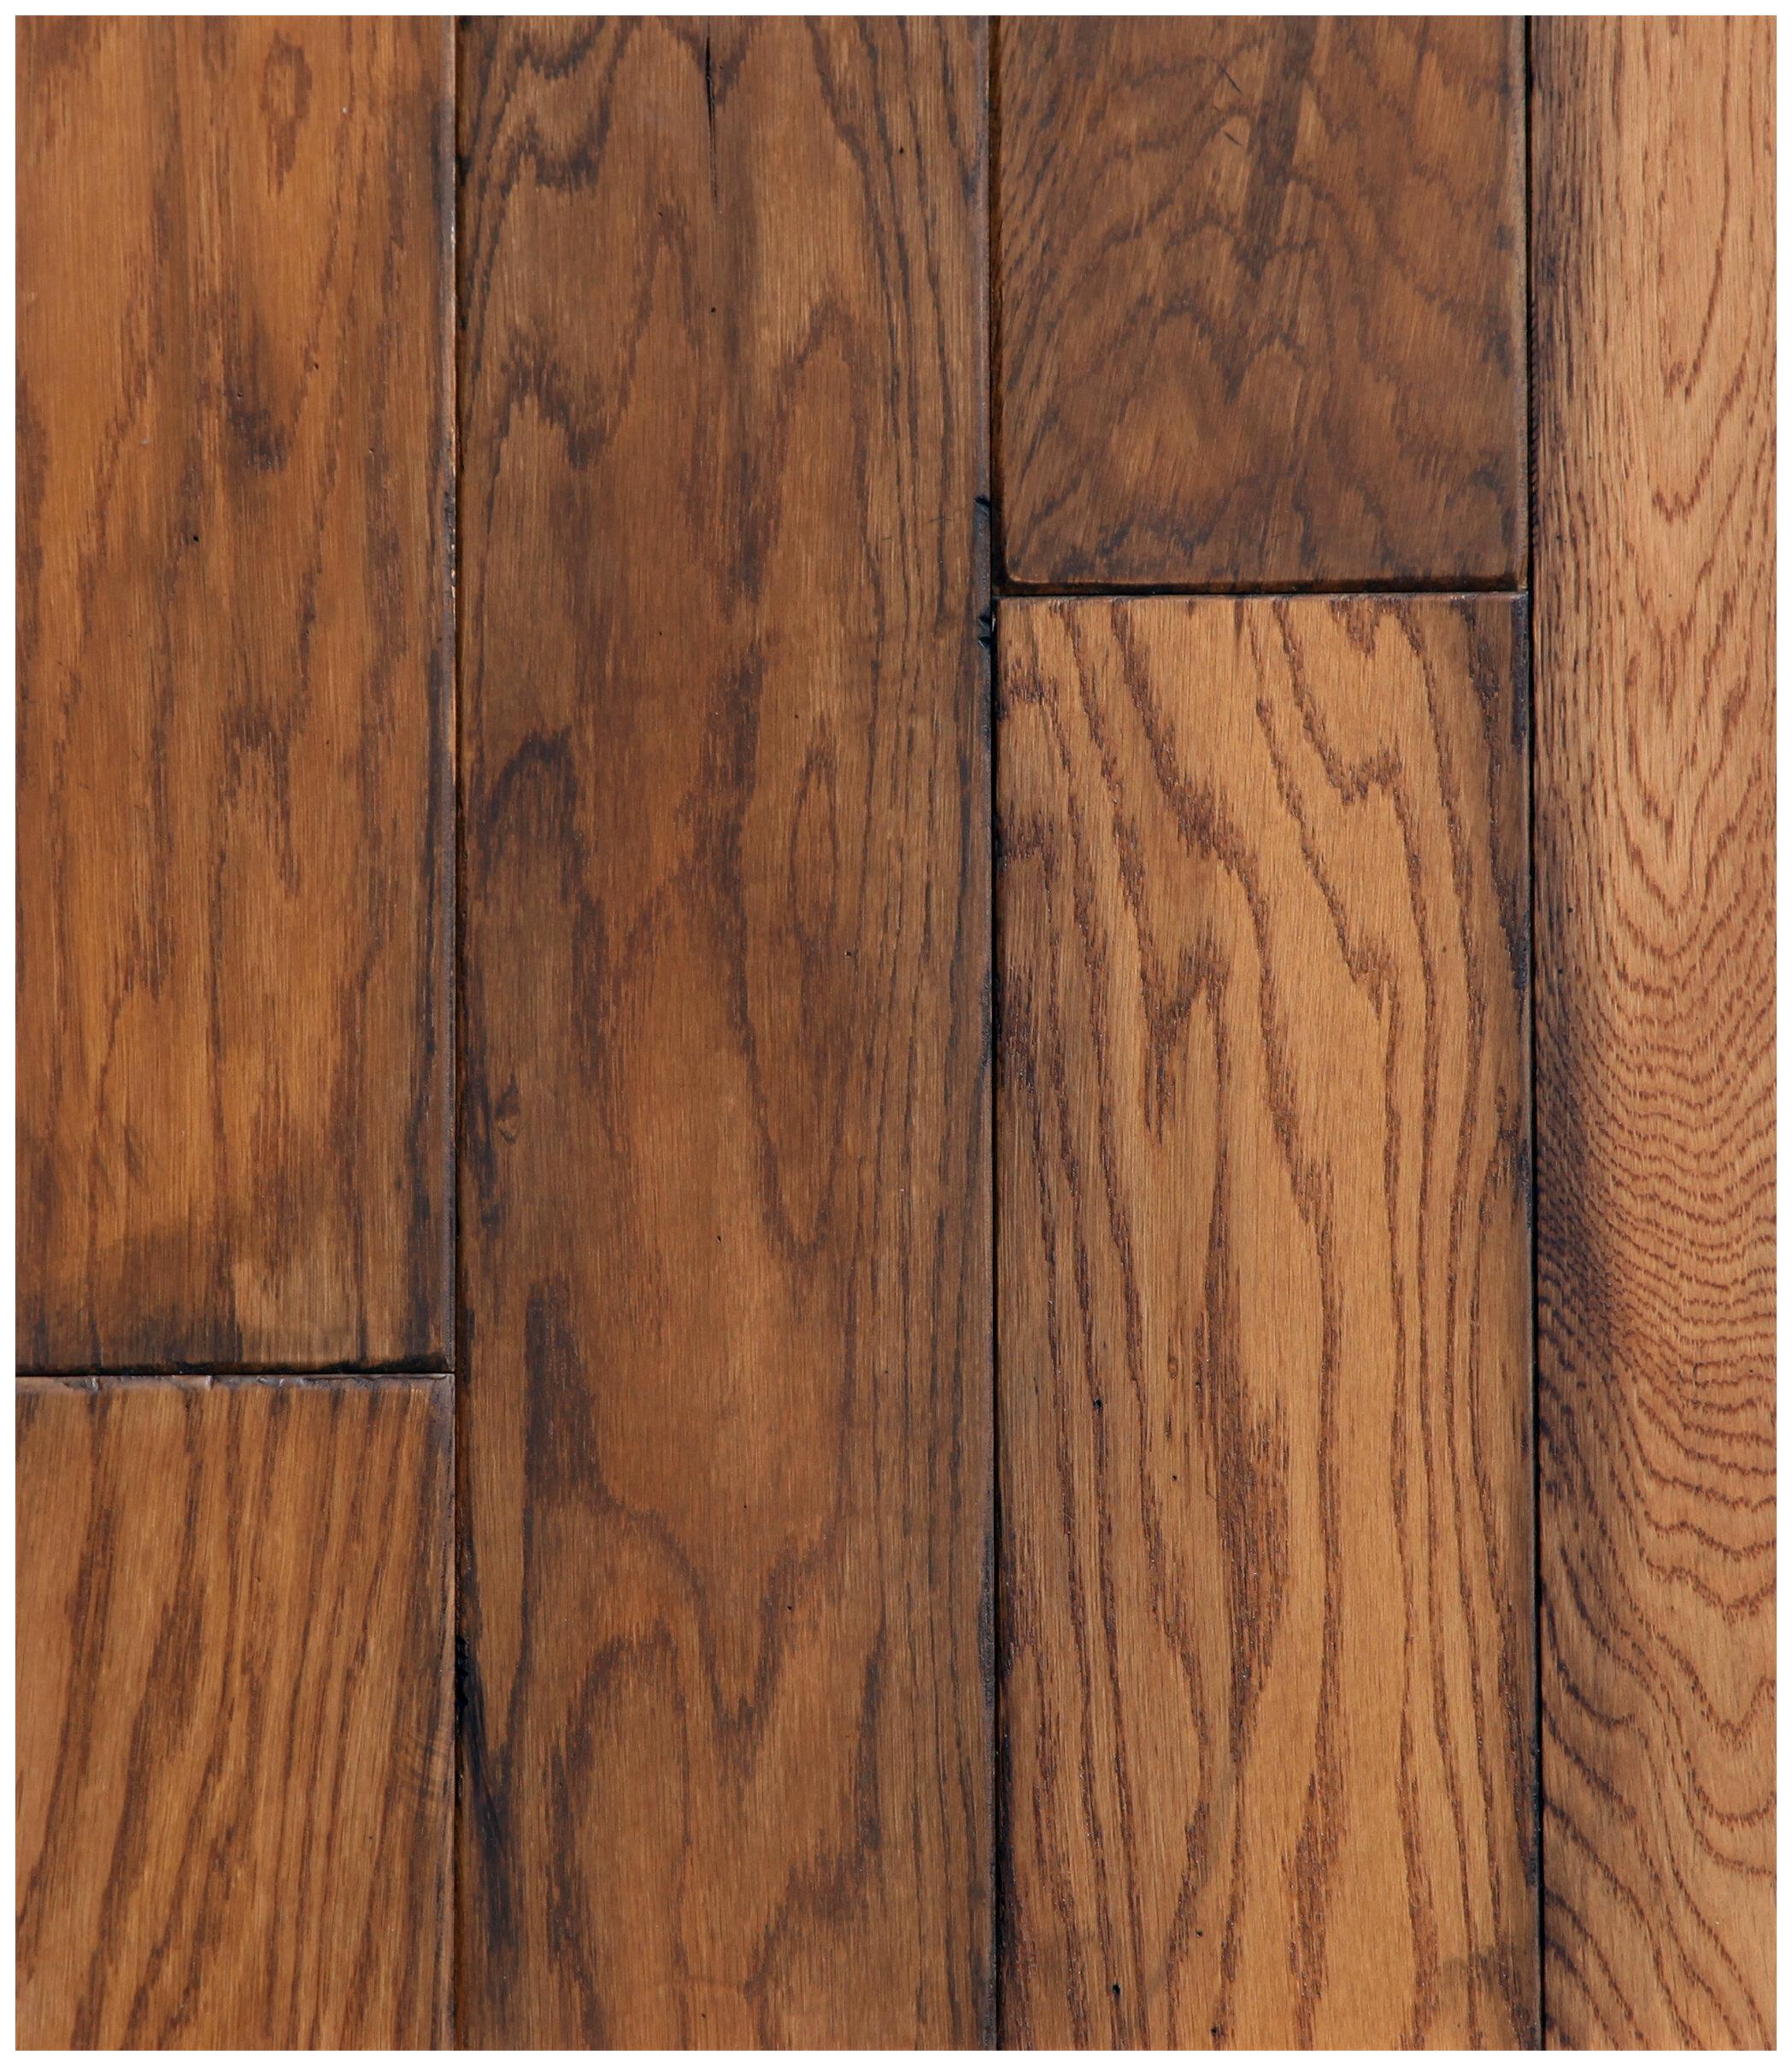 Easoon Usa 5 Engineered White Oak Hardwood Flooring In Artisan Reviews Wayfair